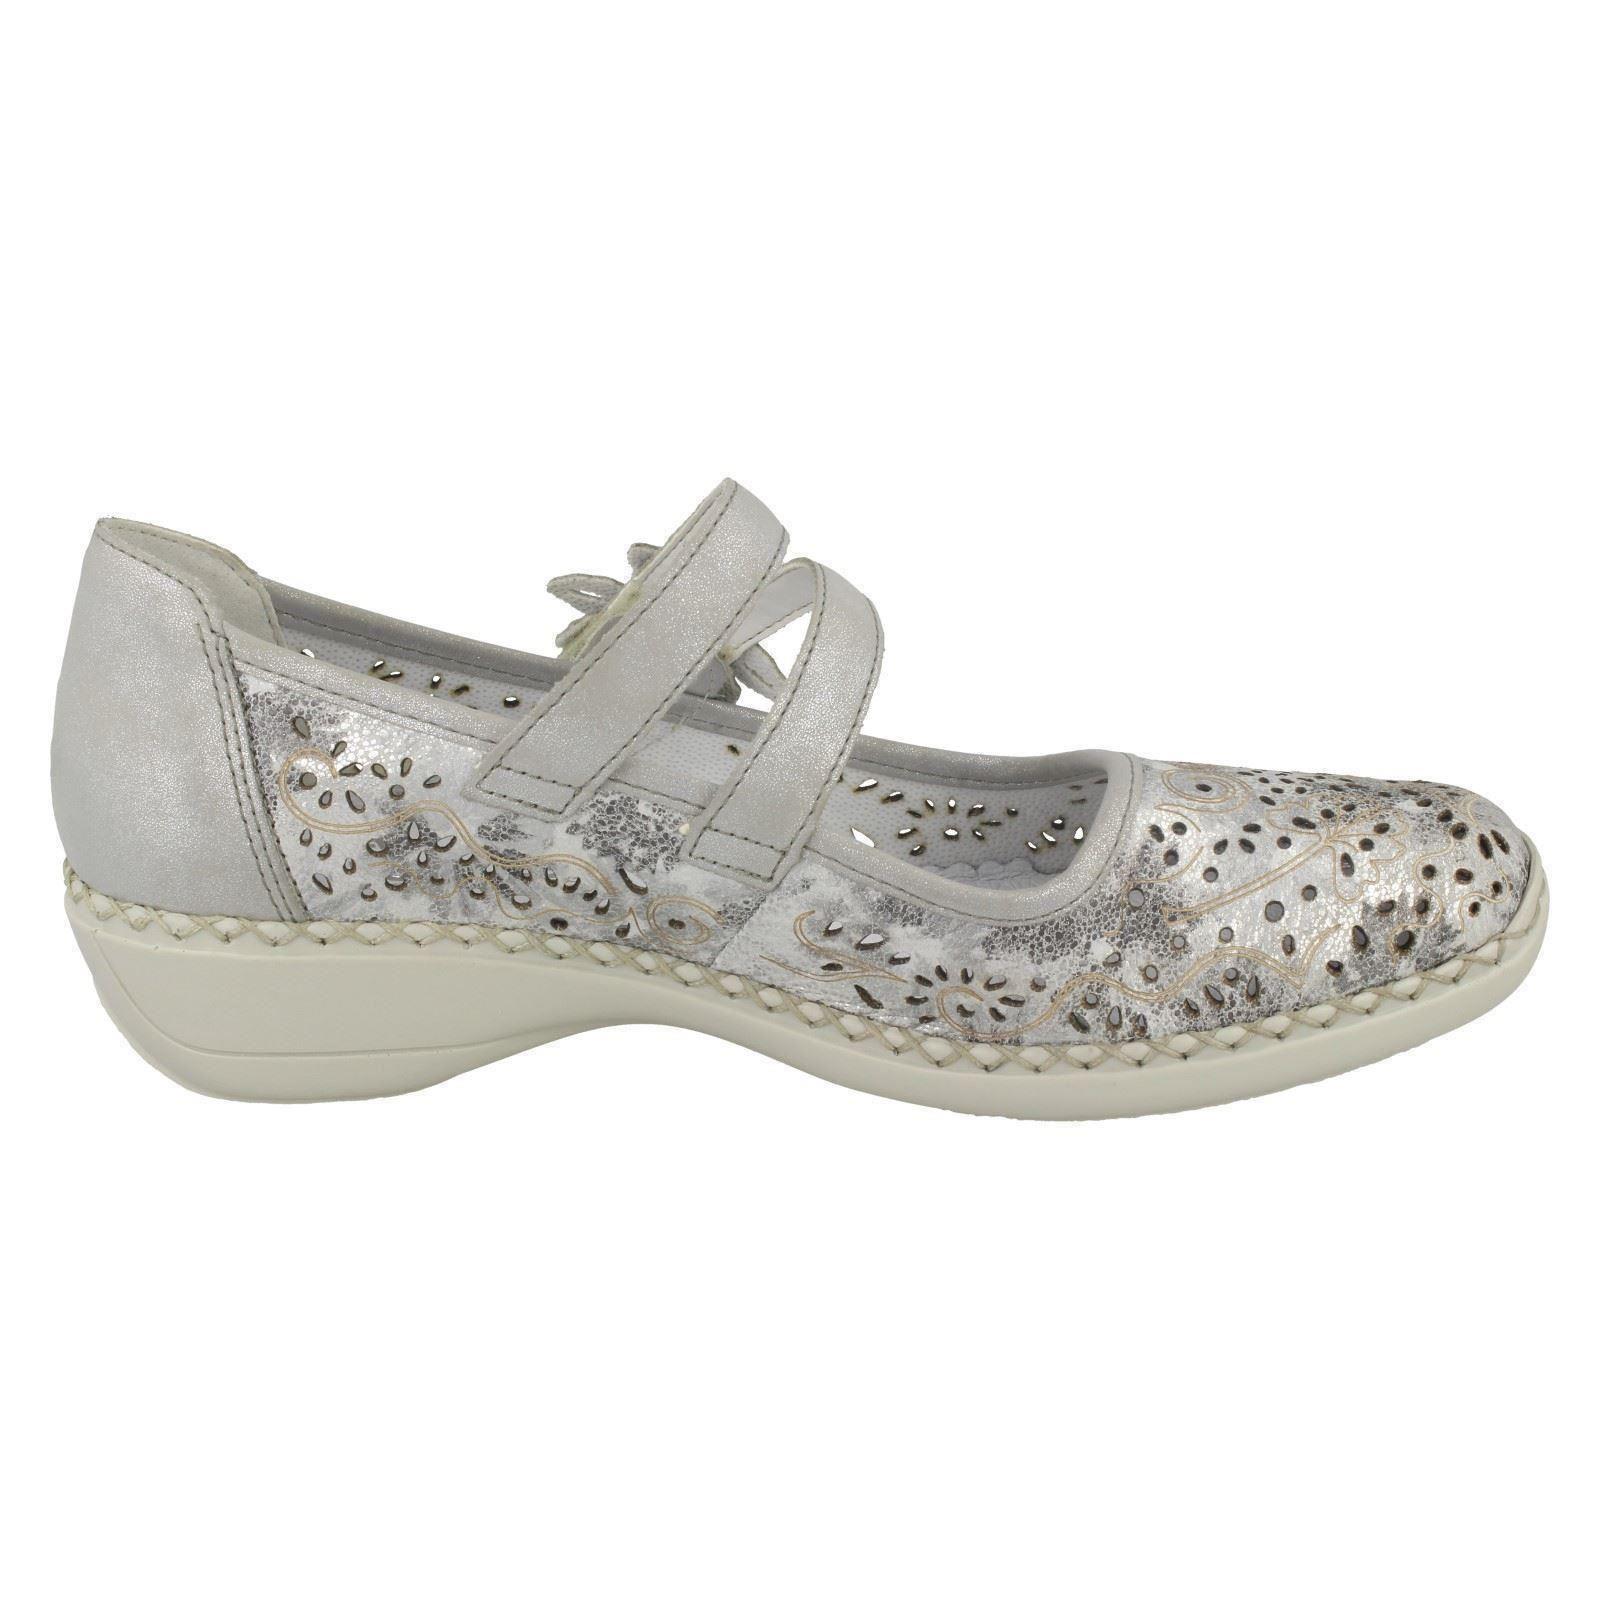 Damen Rieker Flache Schuhe Schuhe Schuhe 41372 f0e1b8